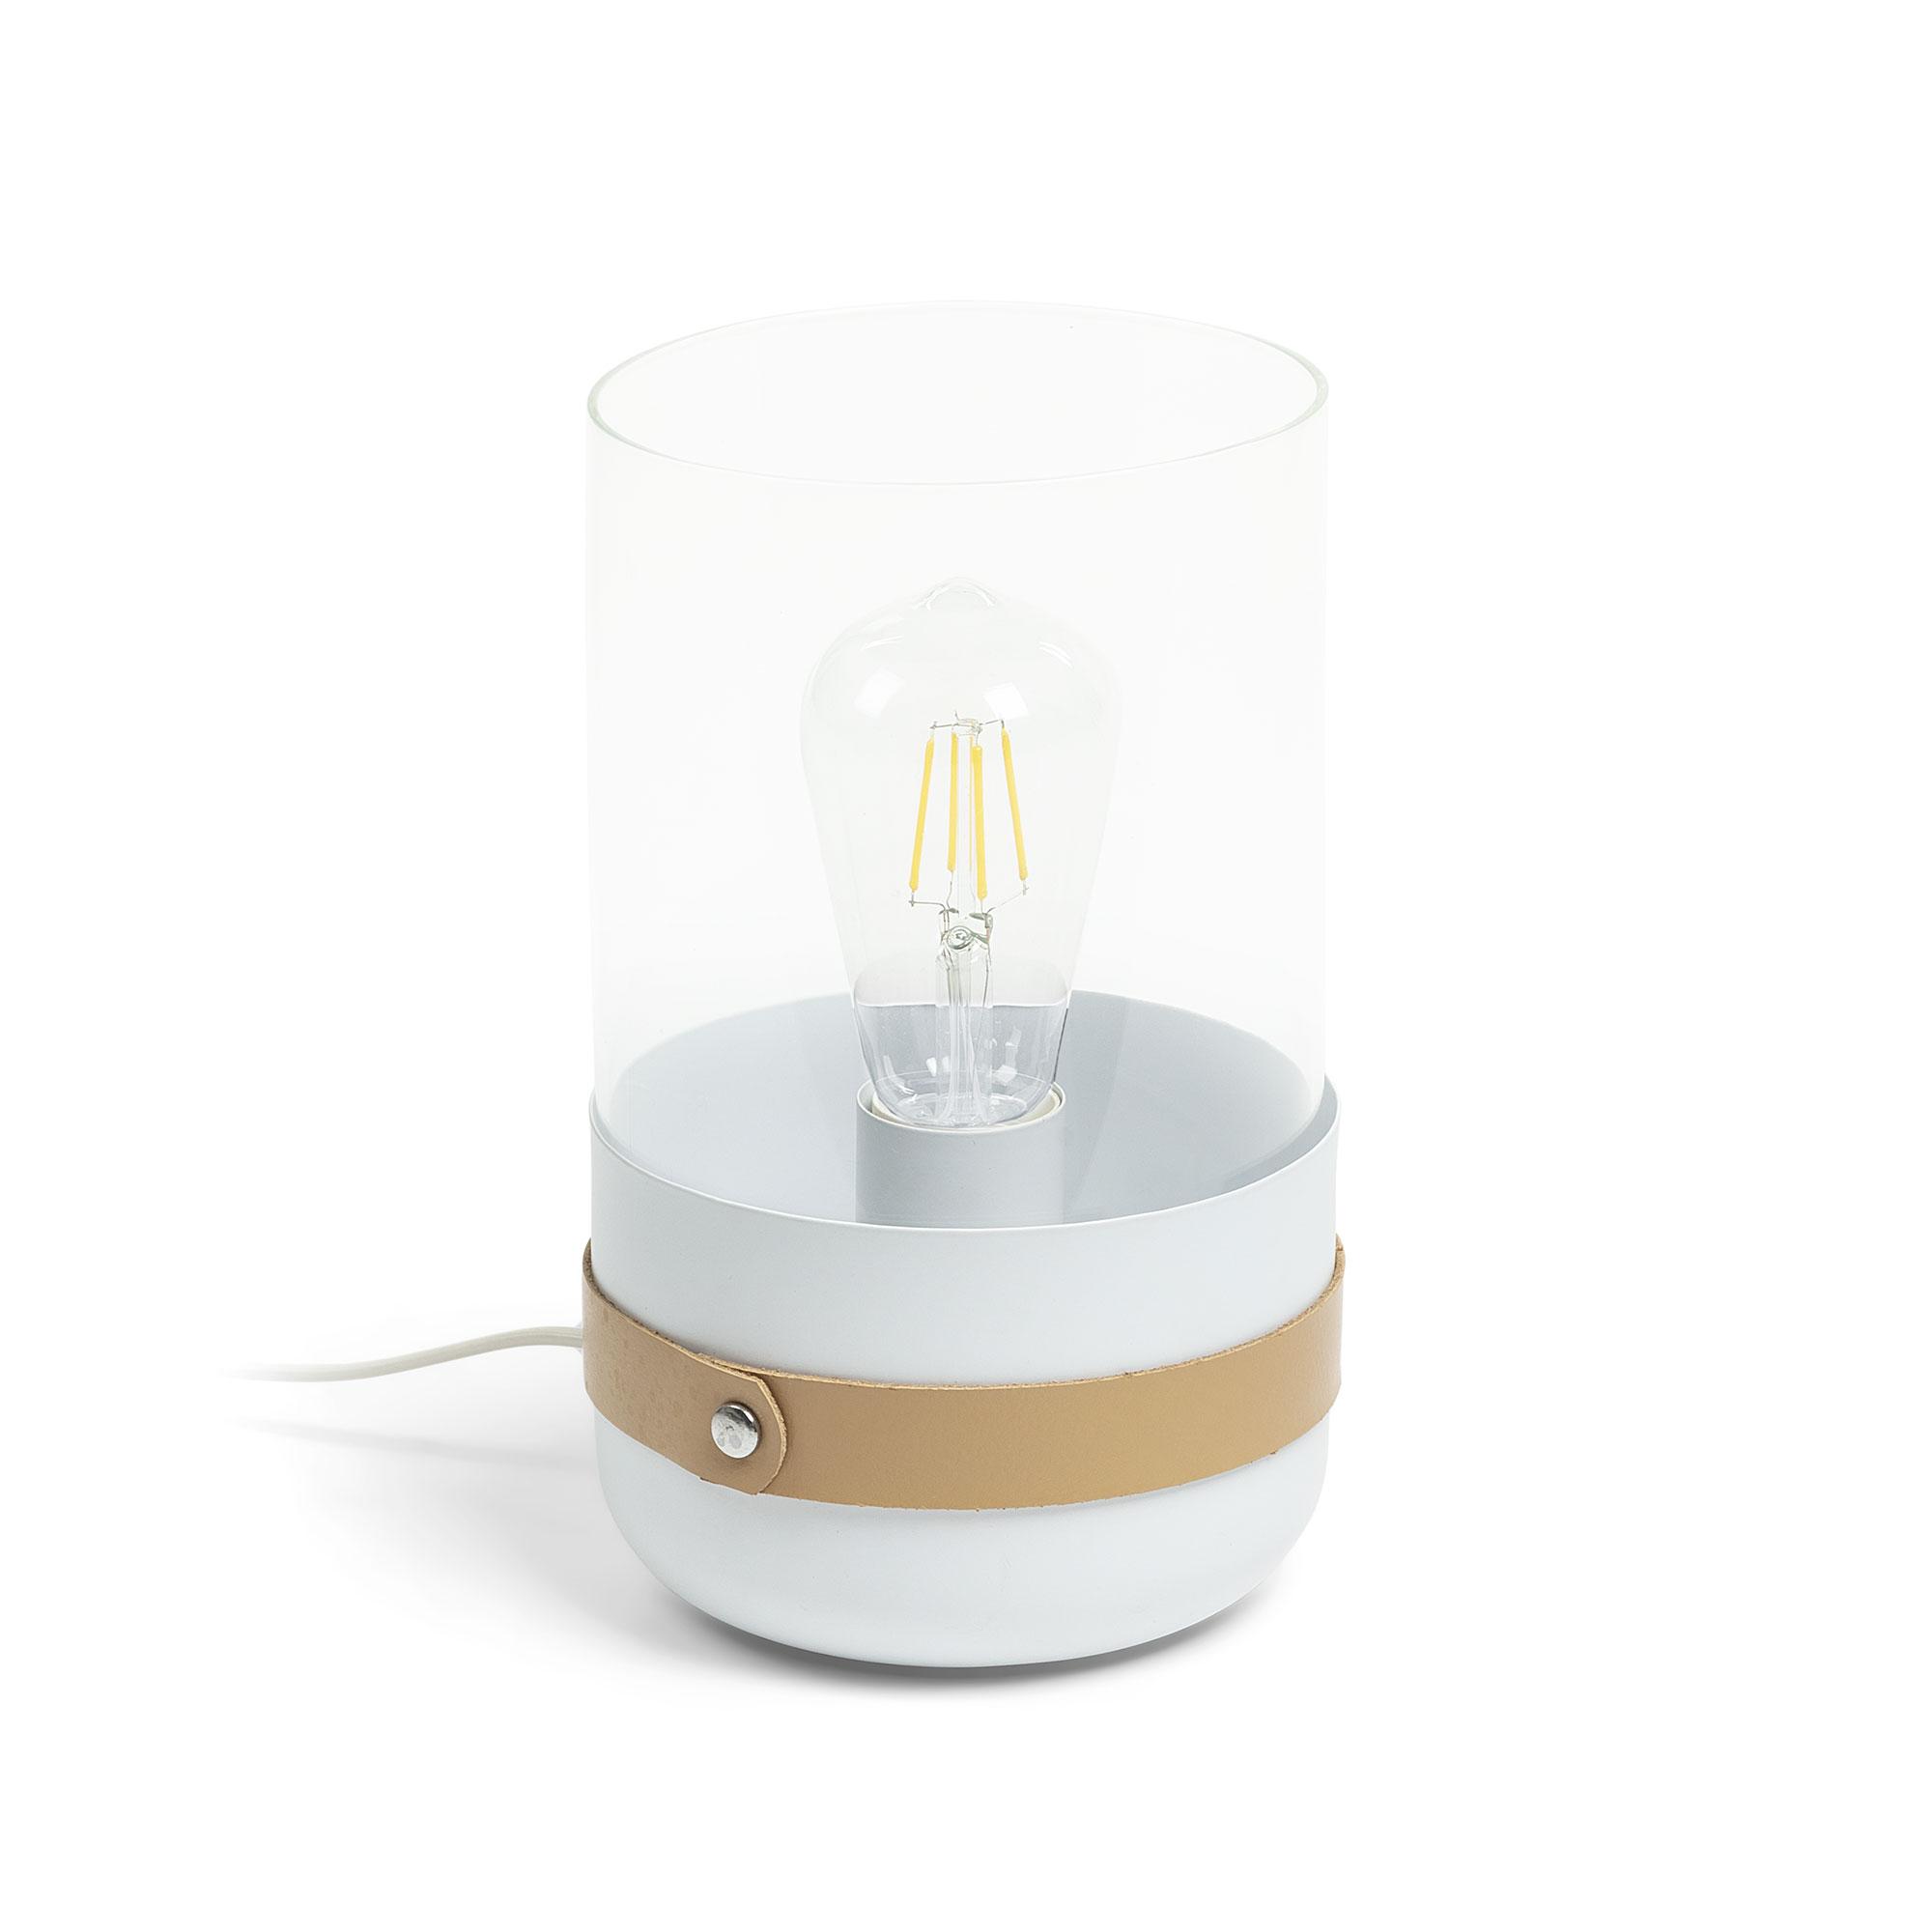 laforma Laforma ramford bordlampe - hvid/natur/klar metal/læder/glas, rund (ø15) på boboonline.dk